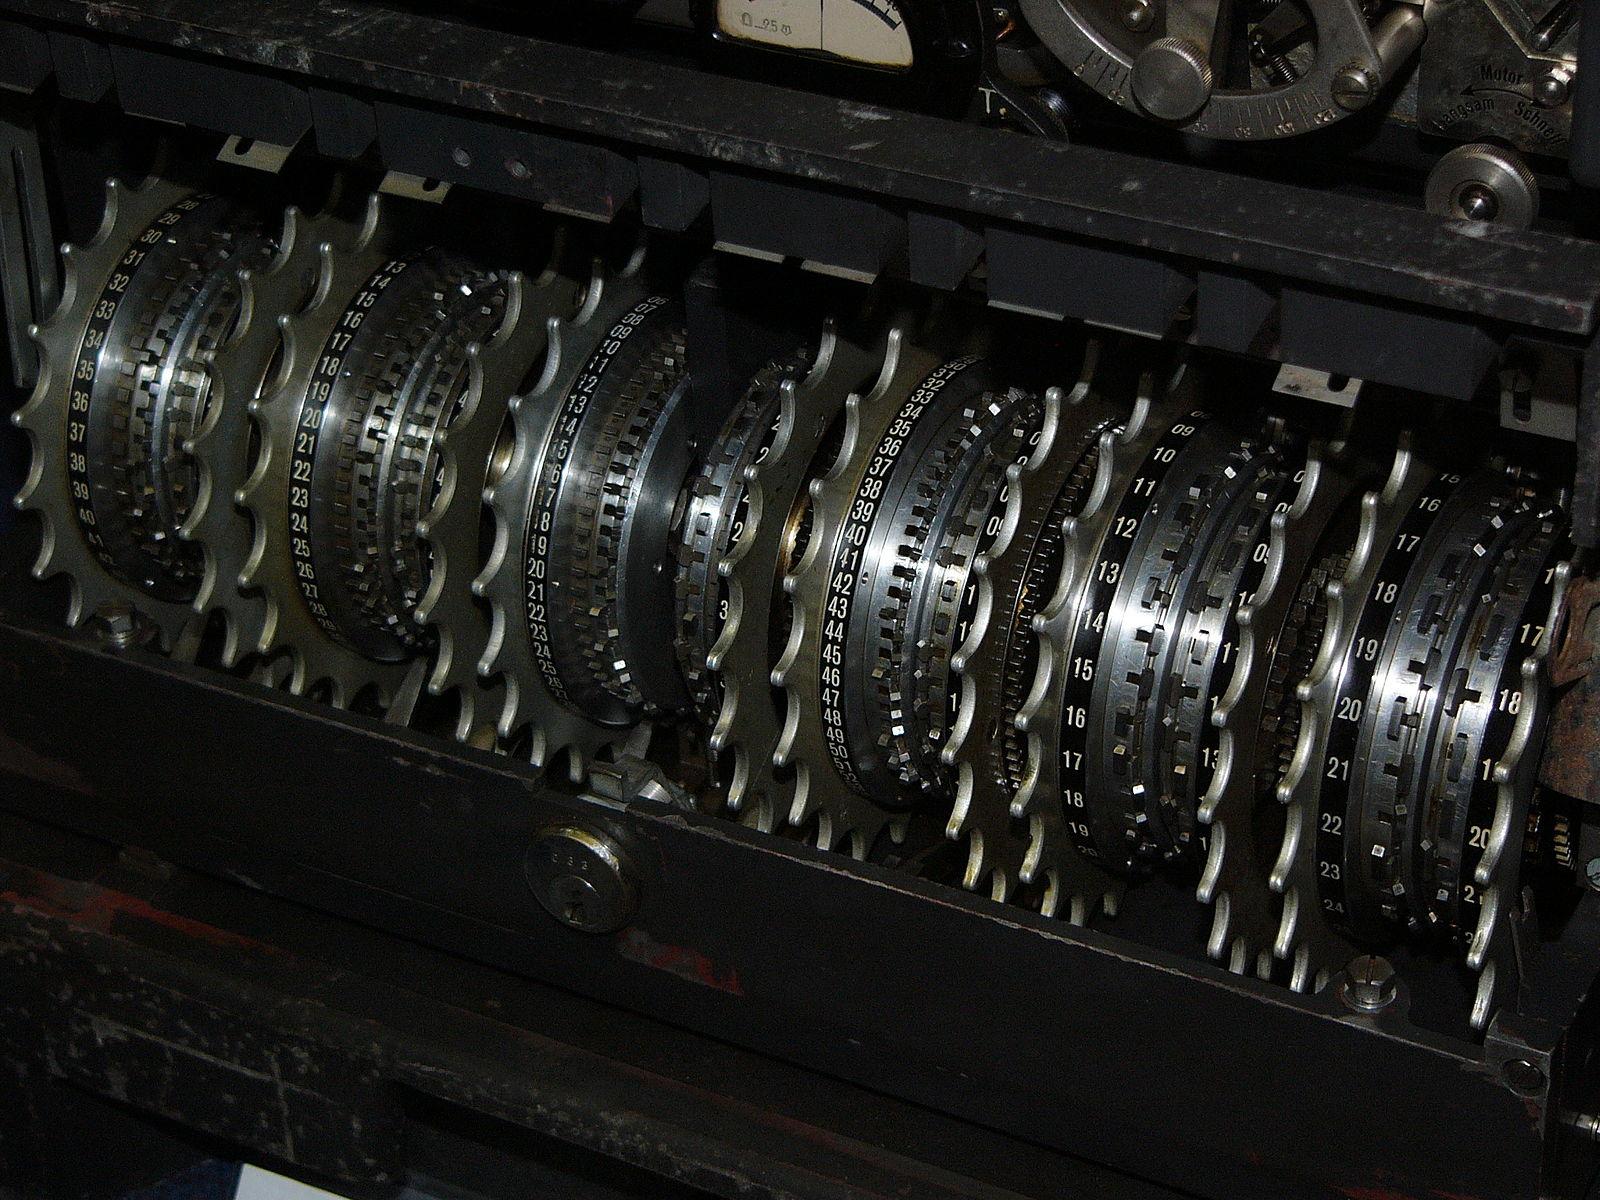 Lorenz SZ42 encryption